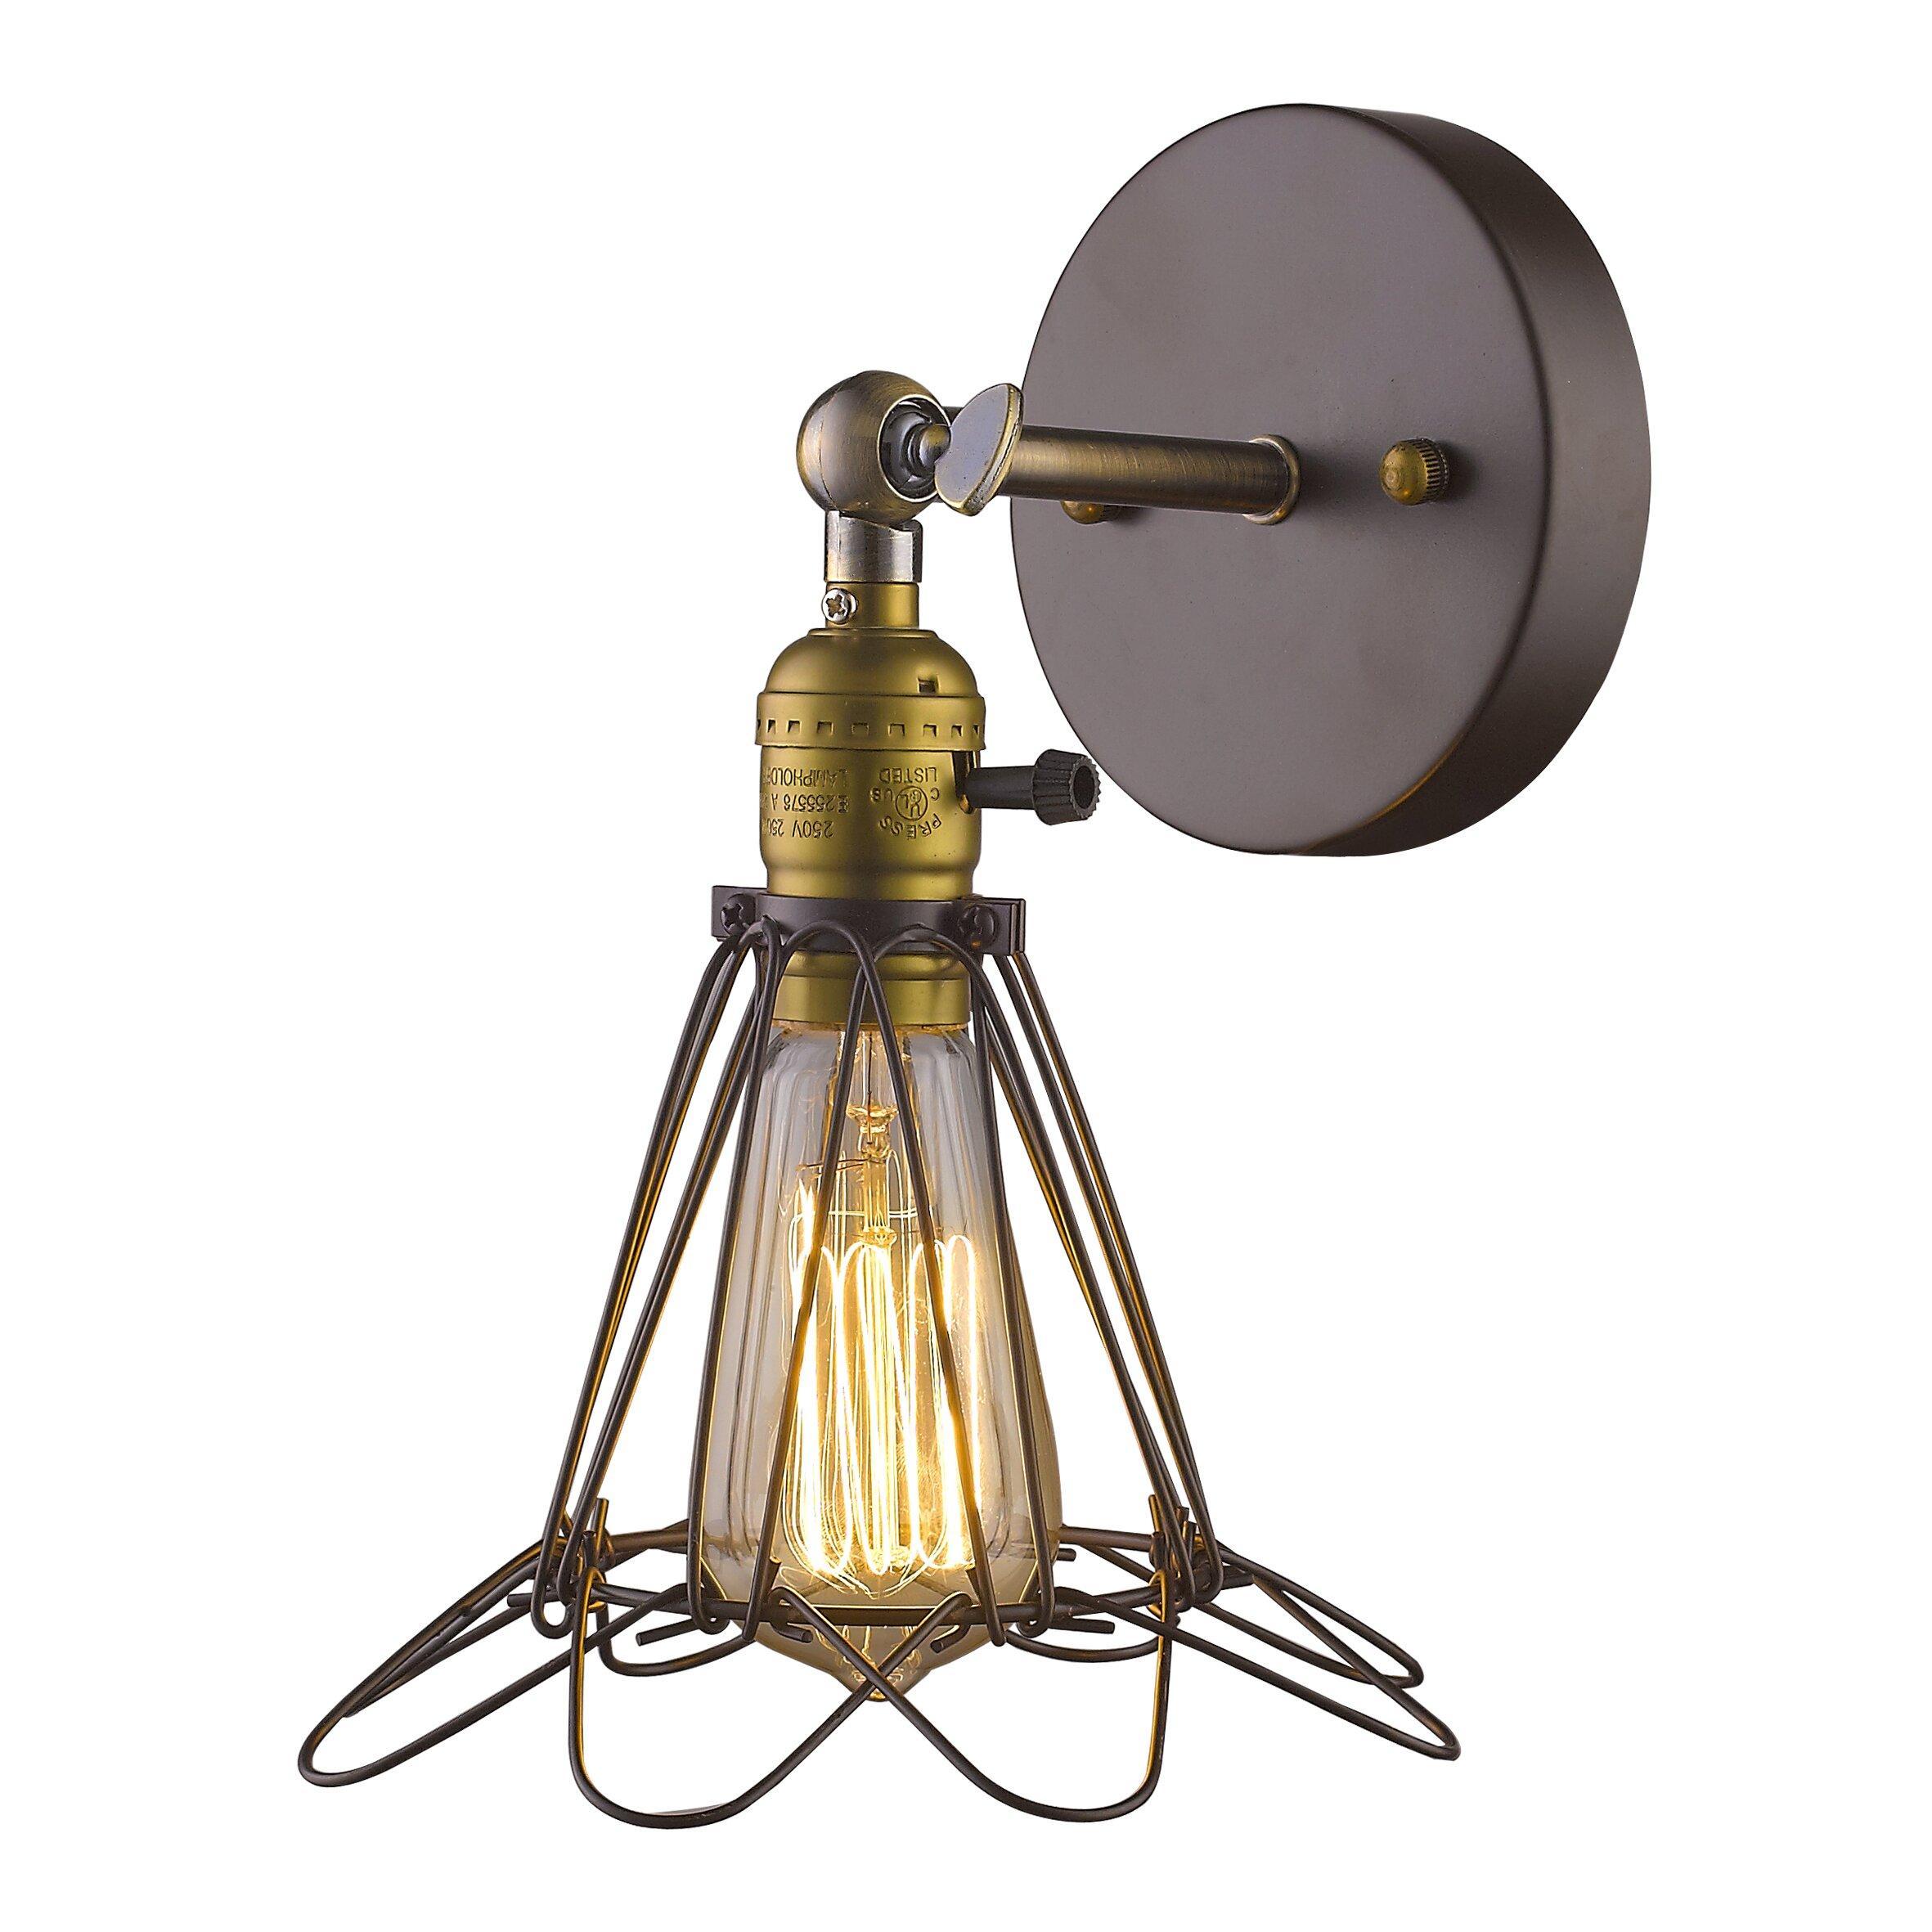 Metal Wall Sconces Lighting : Chloe Lighting Ironclad 1 Light Metal Wall Sconce & Reviews Wayfair